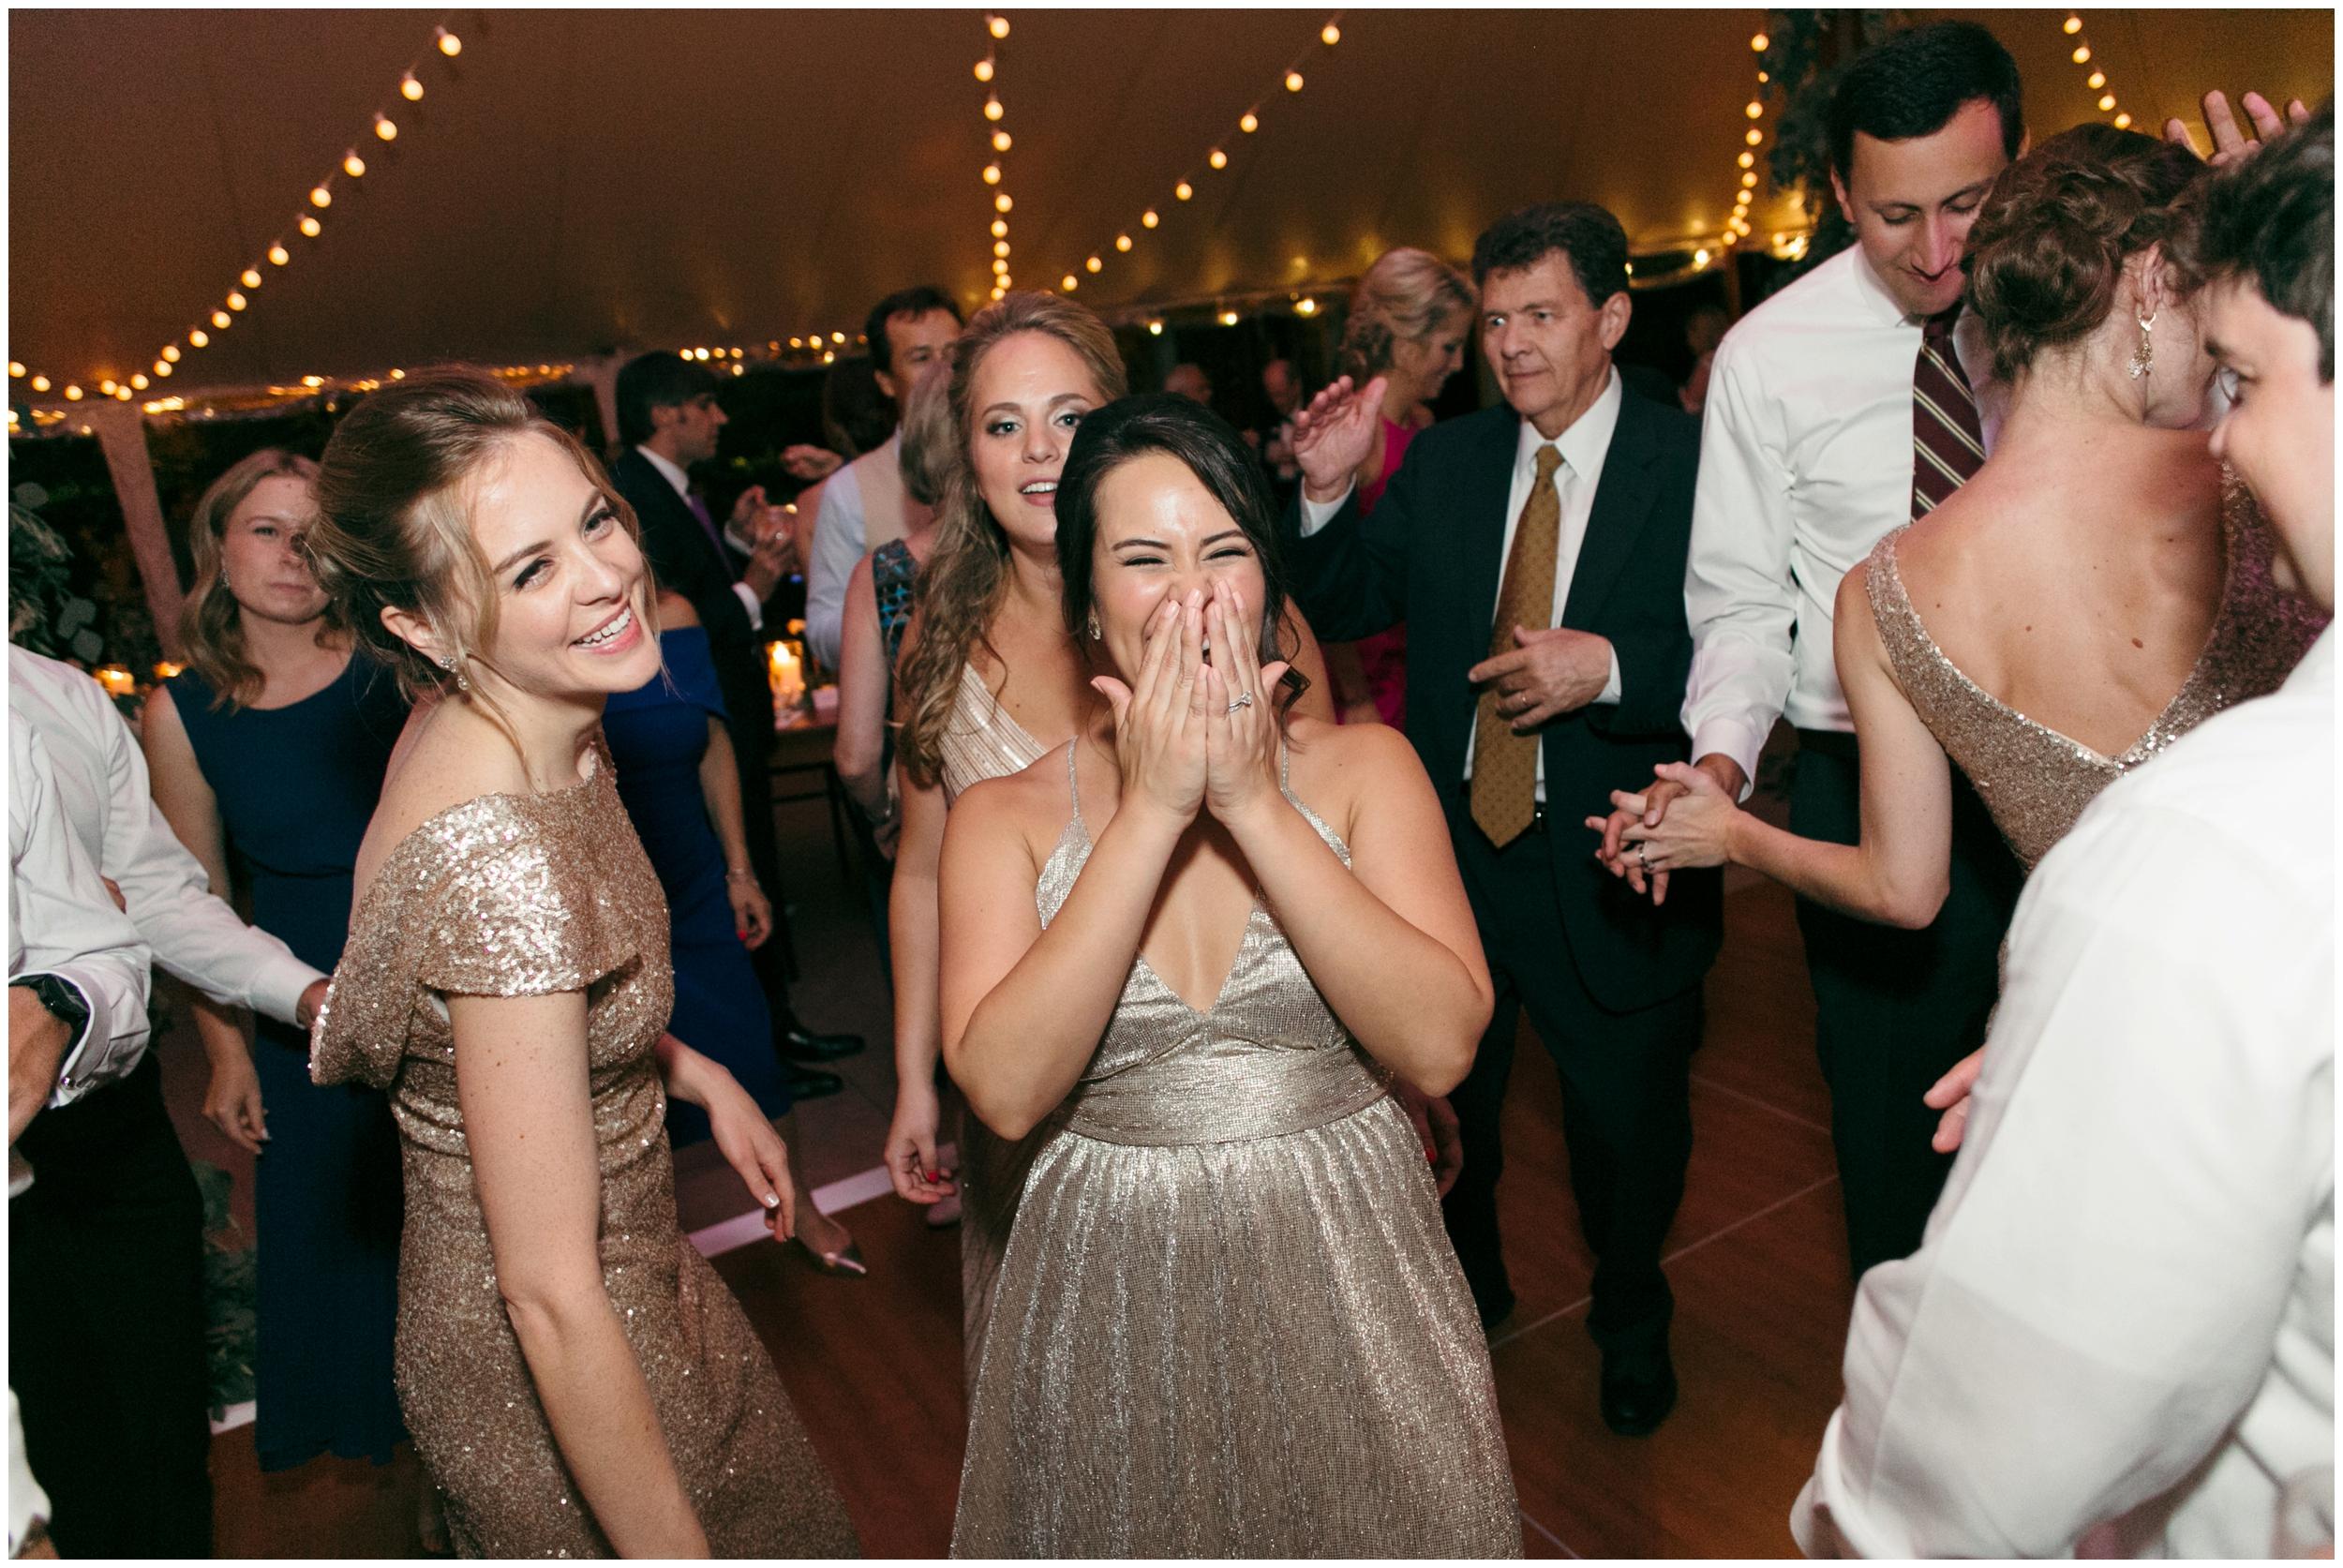 Willowdale-Estate-Wedding-Bailey-Q-Photo-Boston-Wedding-Photographer-109.JPG